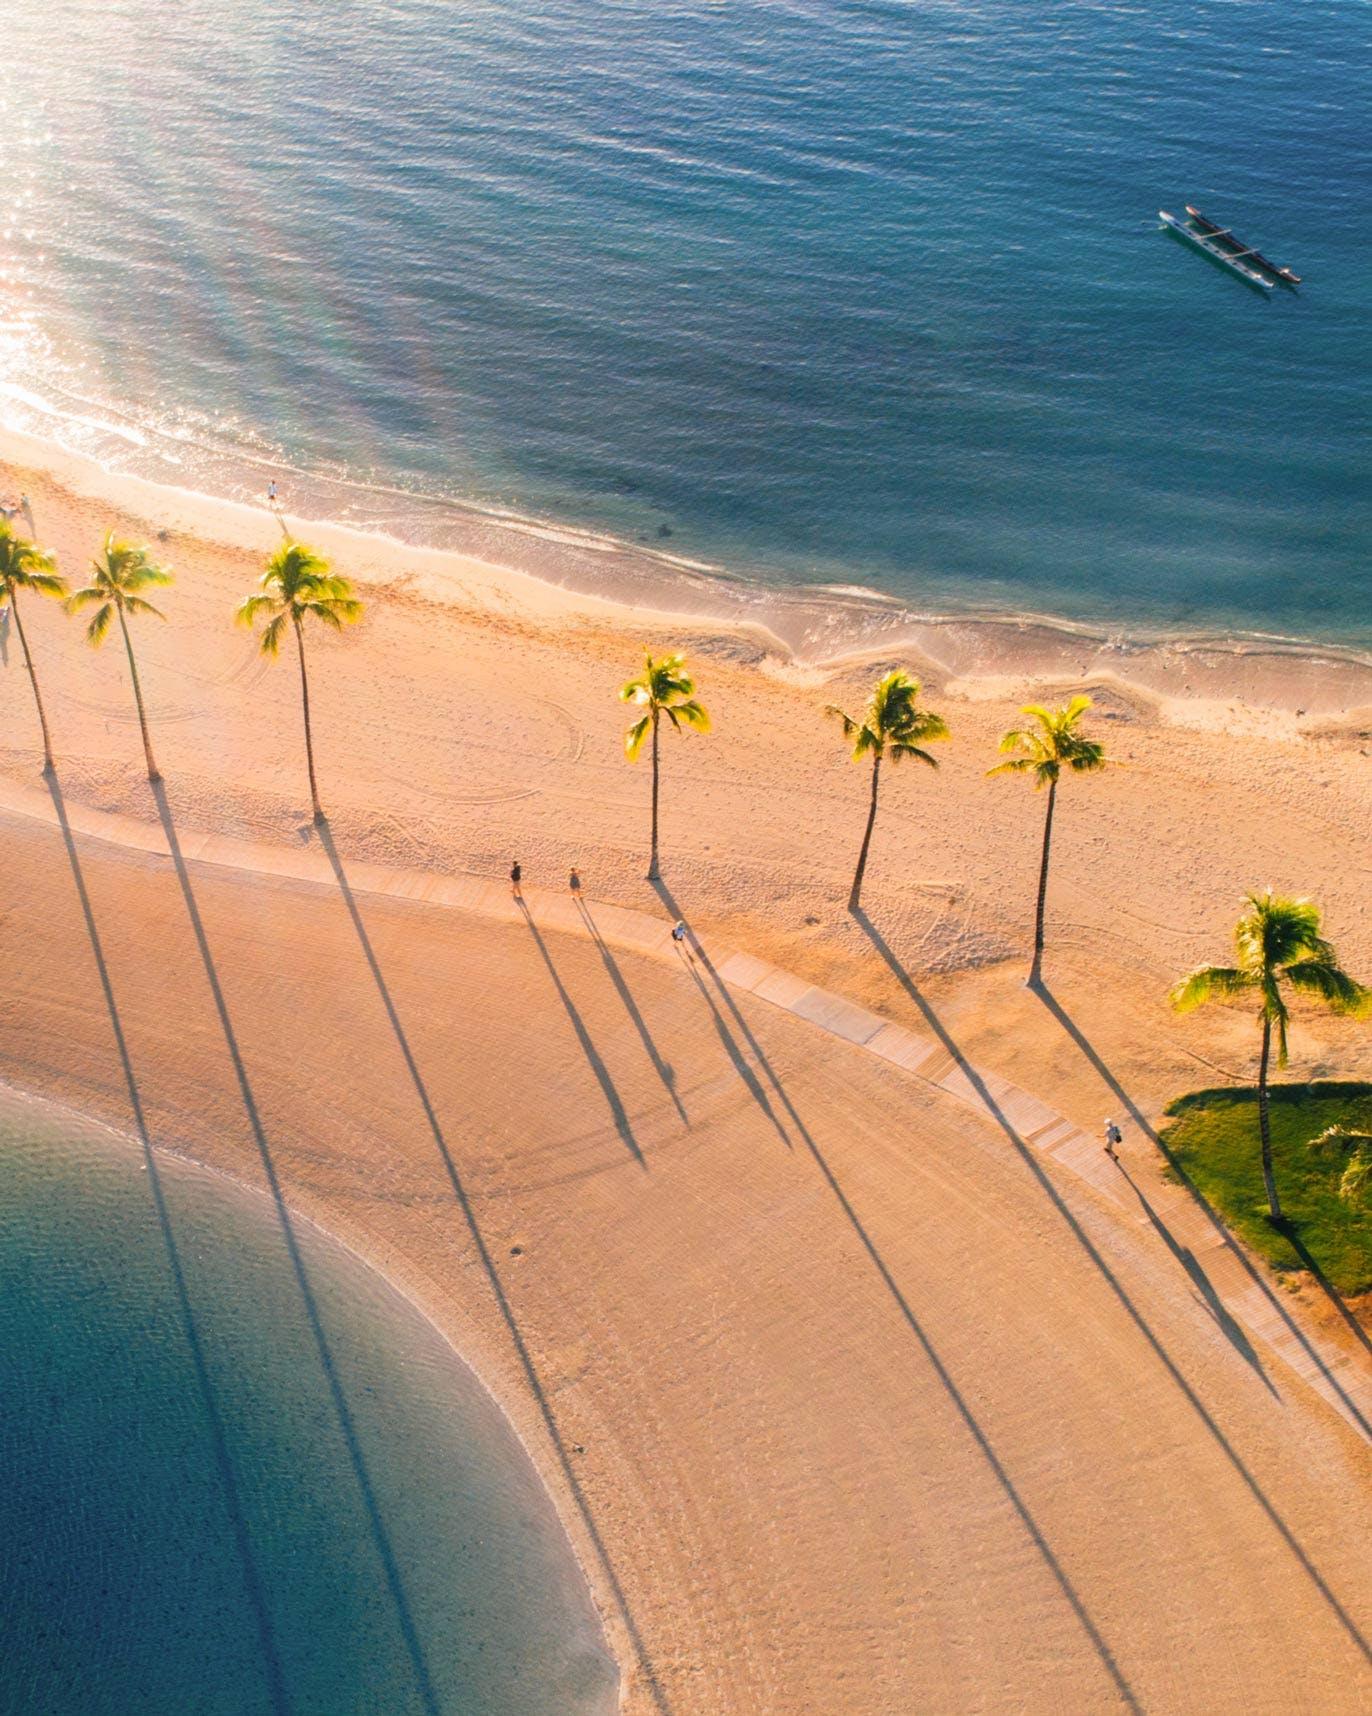 Hilton Lagoon, Duke Kahanamoku Lagoon Boardwalk & Kahanamoku Beach Angled Look Down